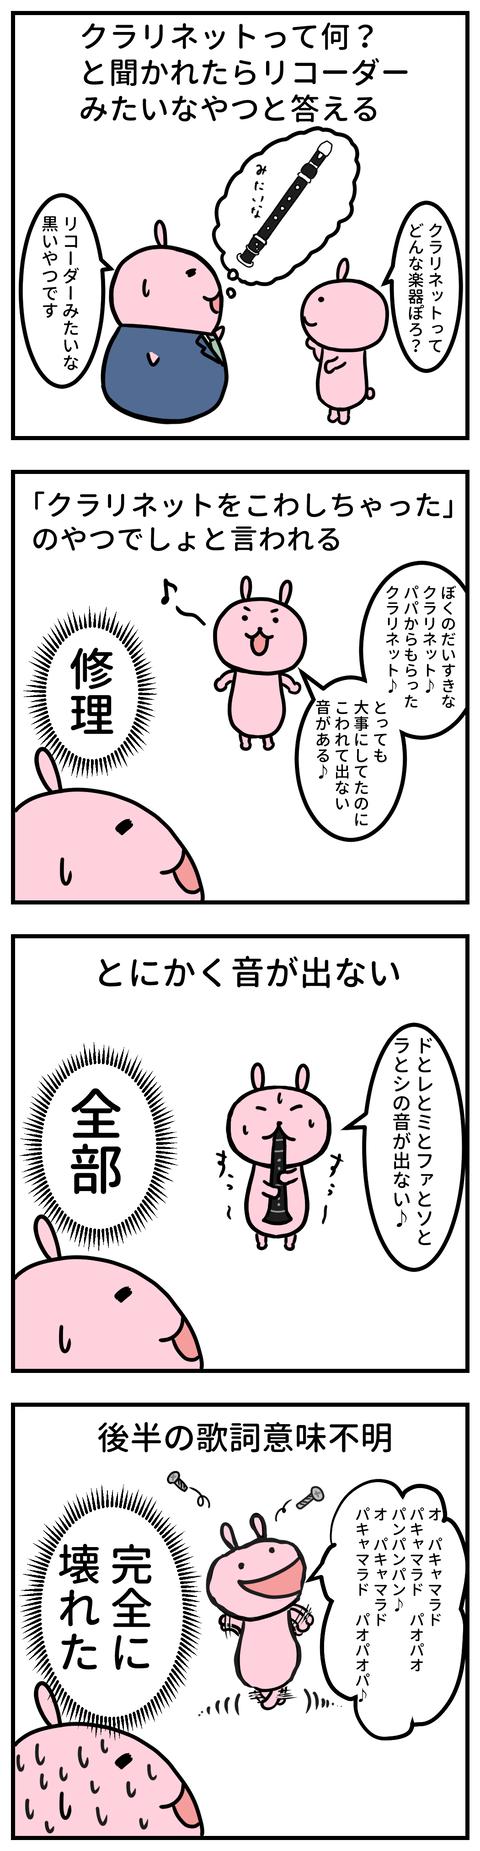 manga-yuzuporo35-1